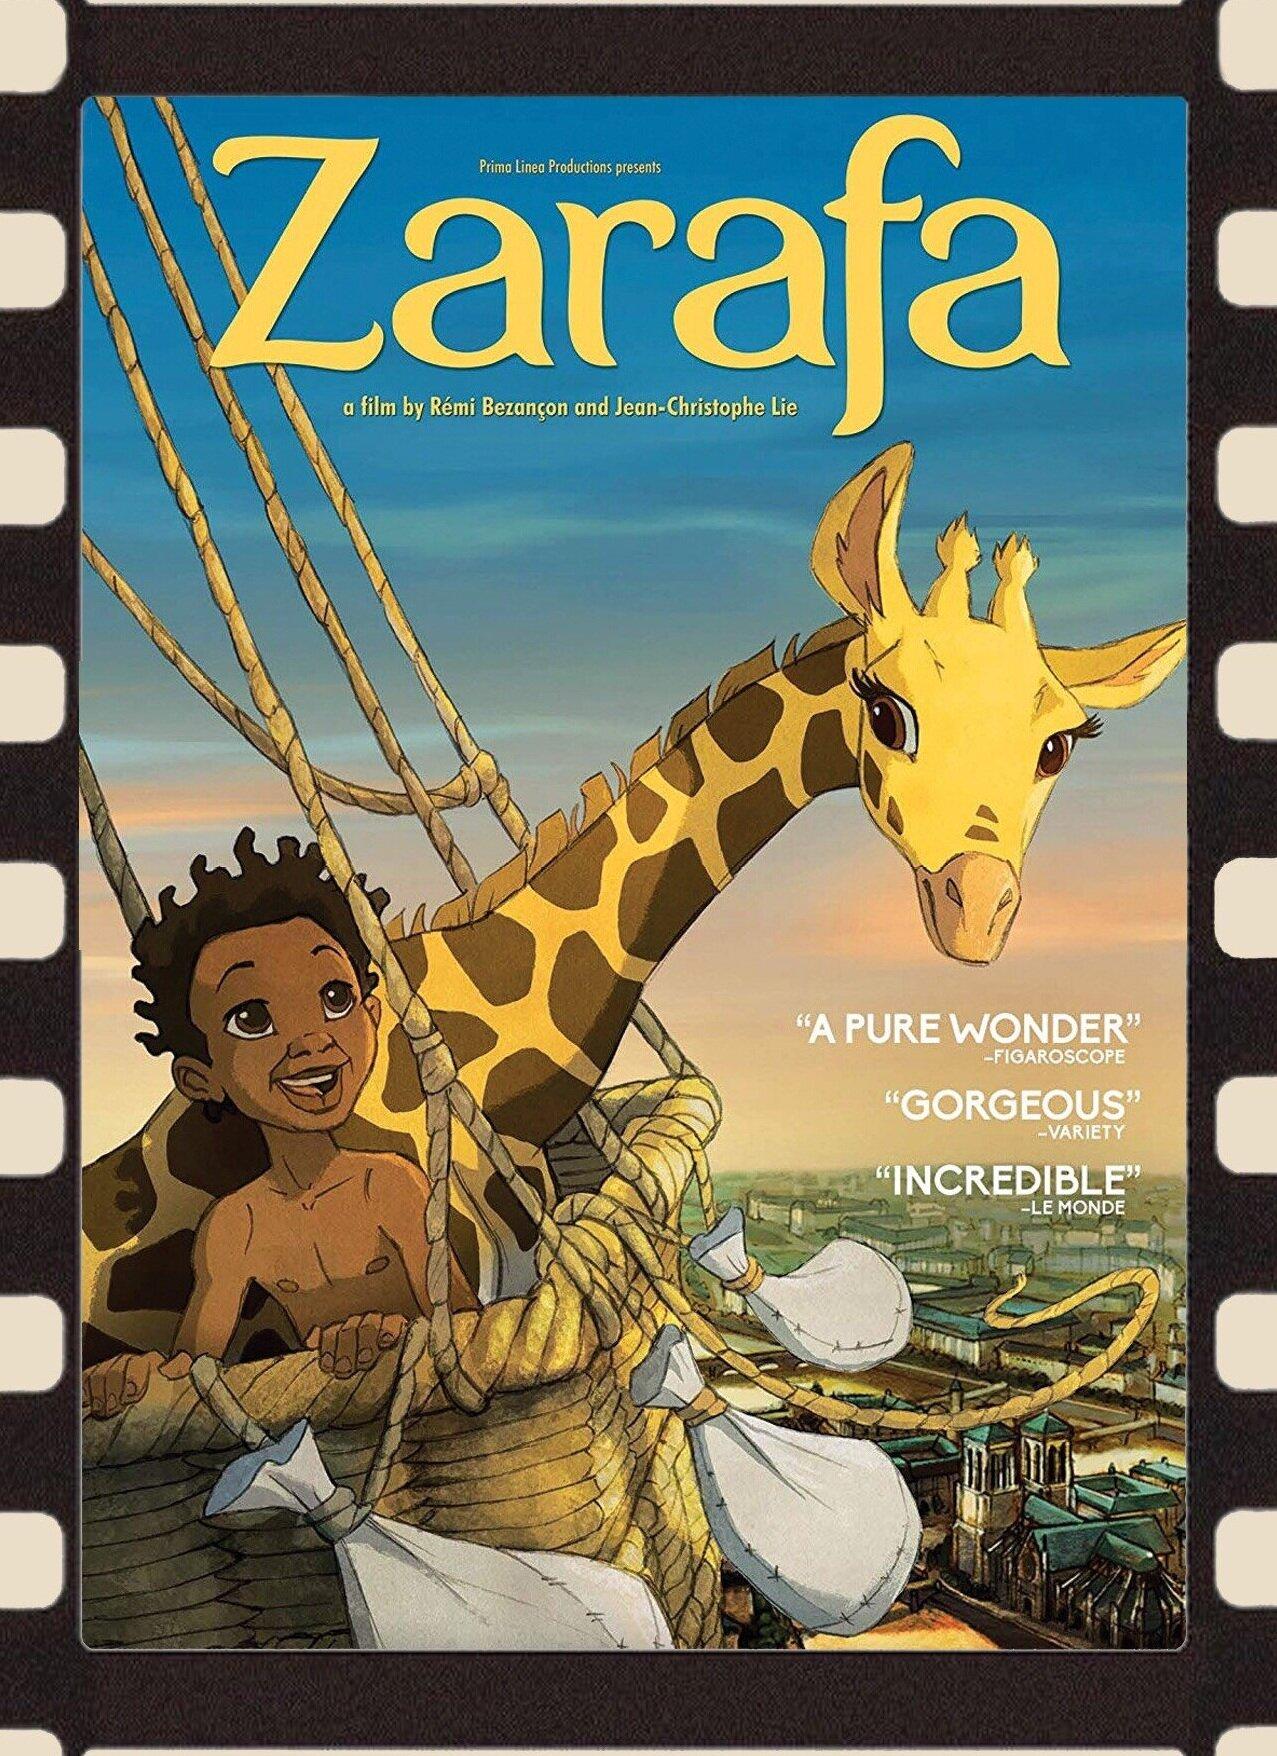 Zarafa+PS20+Movie+Night+Oct+4th+6pm.jpg